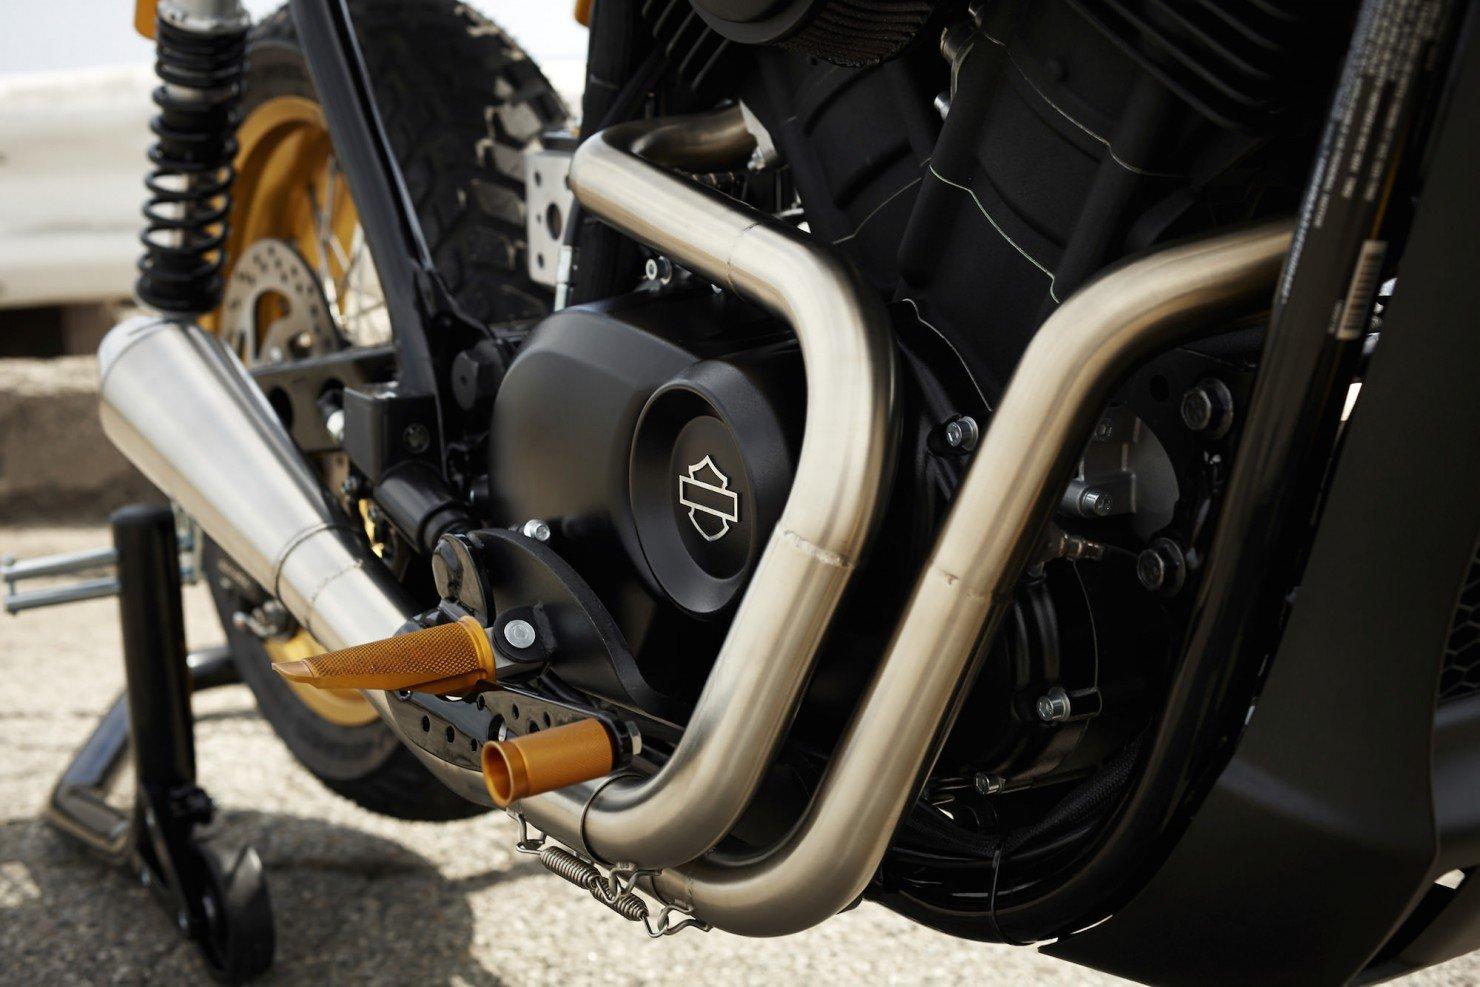 Harley_Davidson_Flat_Tracker_7